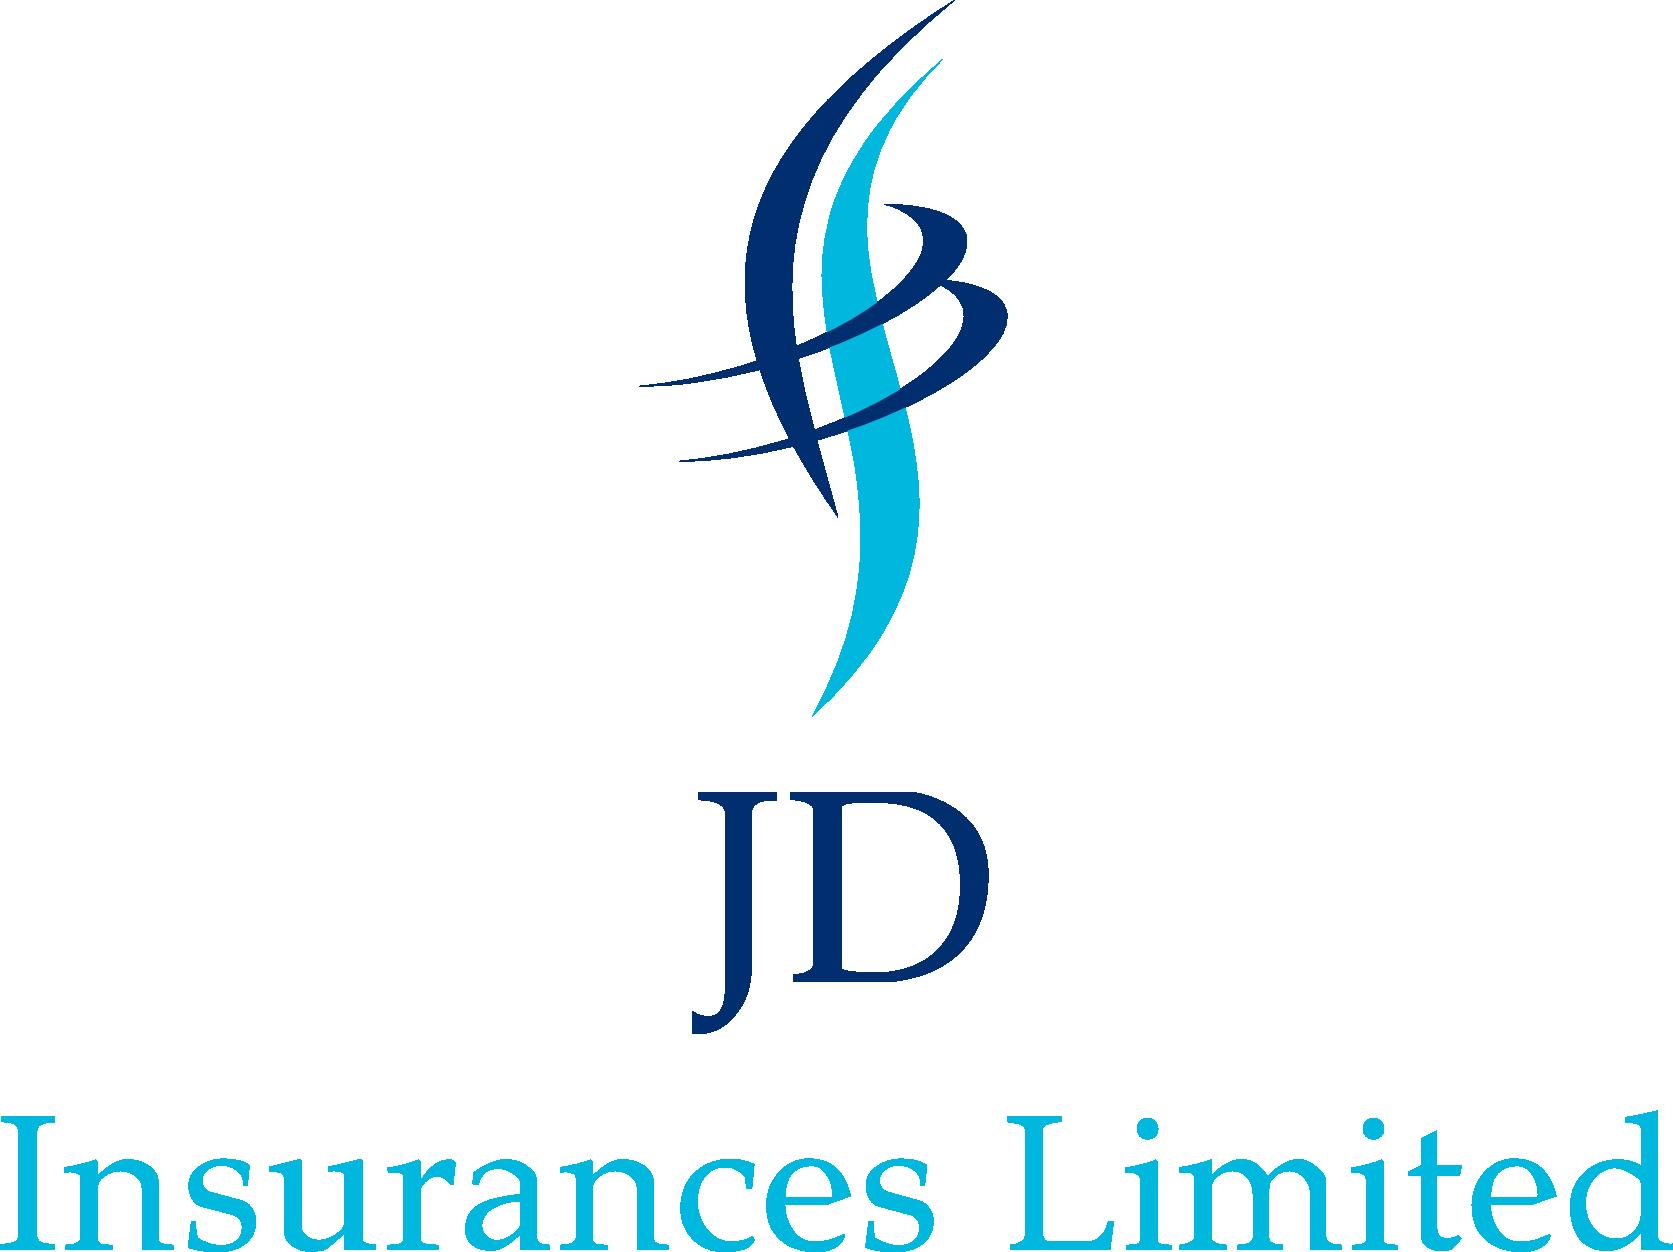 JD Insurance